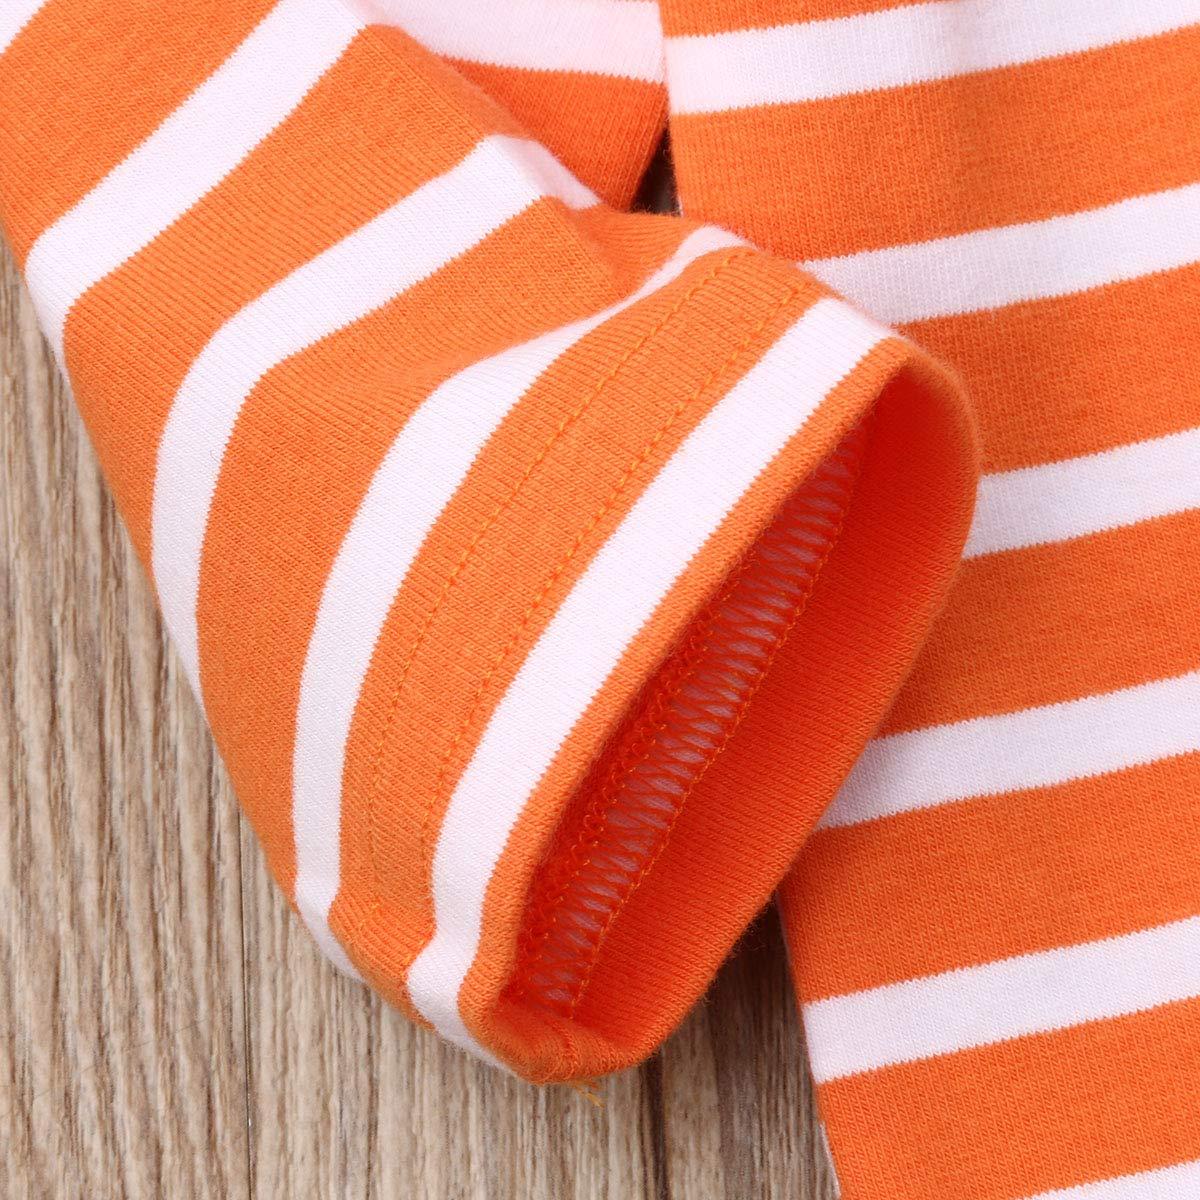 Geagodelia Halloween Newborn Infant Baby Boy Girl Romper Pumpkin Long Sleeve Jumpsuit Hat or Headband Outfit Clothes